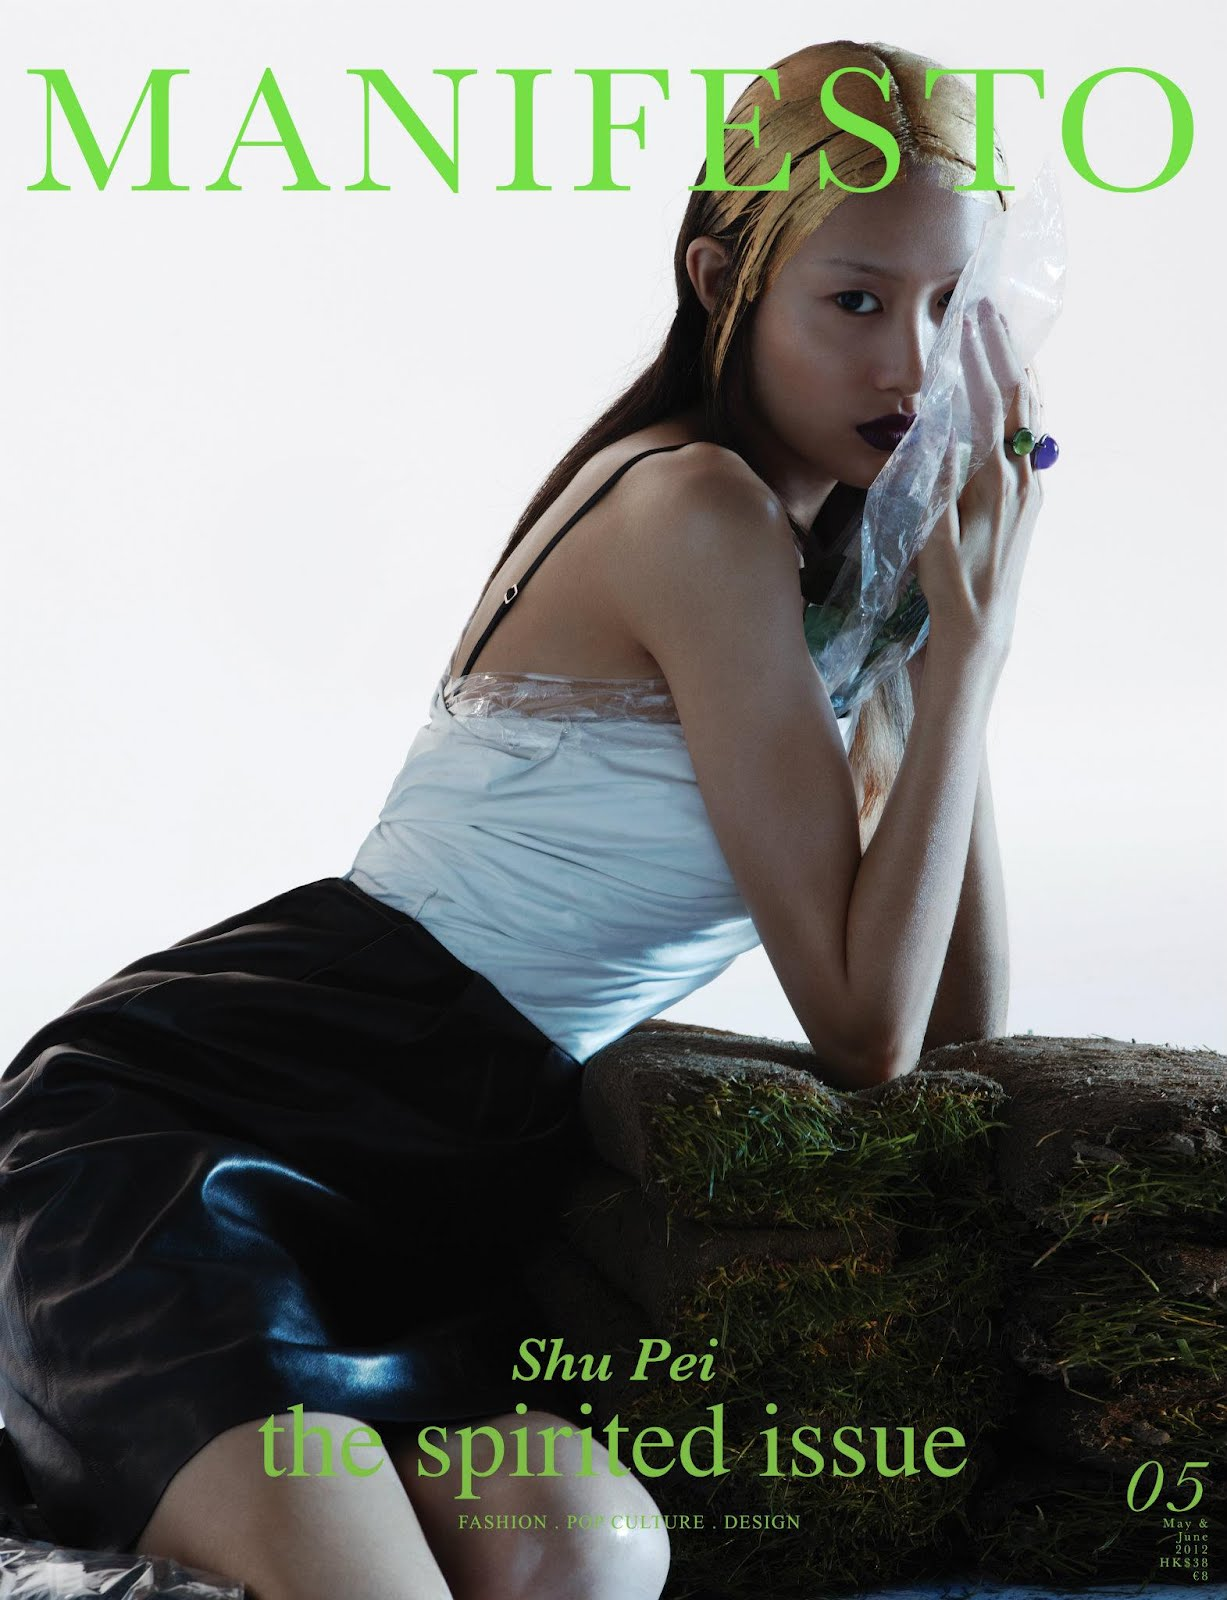 http://1.bp.blogspot.com/-uRy0FIg_bUs/T7FAVVs1x0I/AAAAAAAA28Y/Nr6zGMS_qeU/s1600/Shu+Pei+Fan+Xin+Manifesto+Asia+%235+May:June+2012.jpg